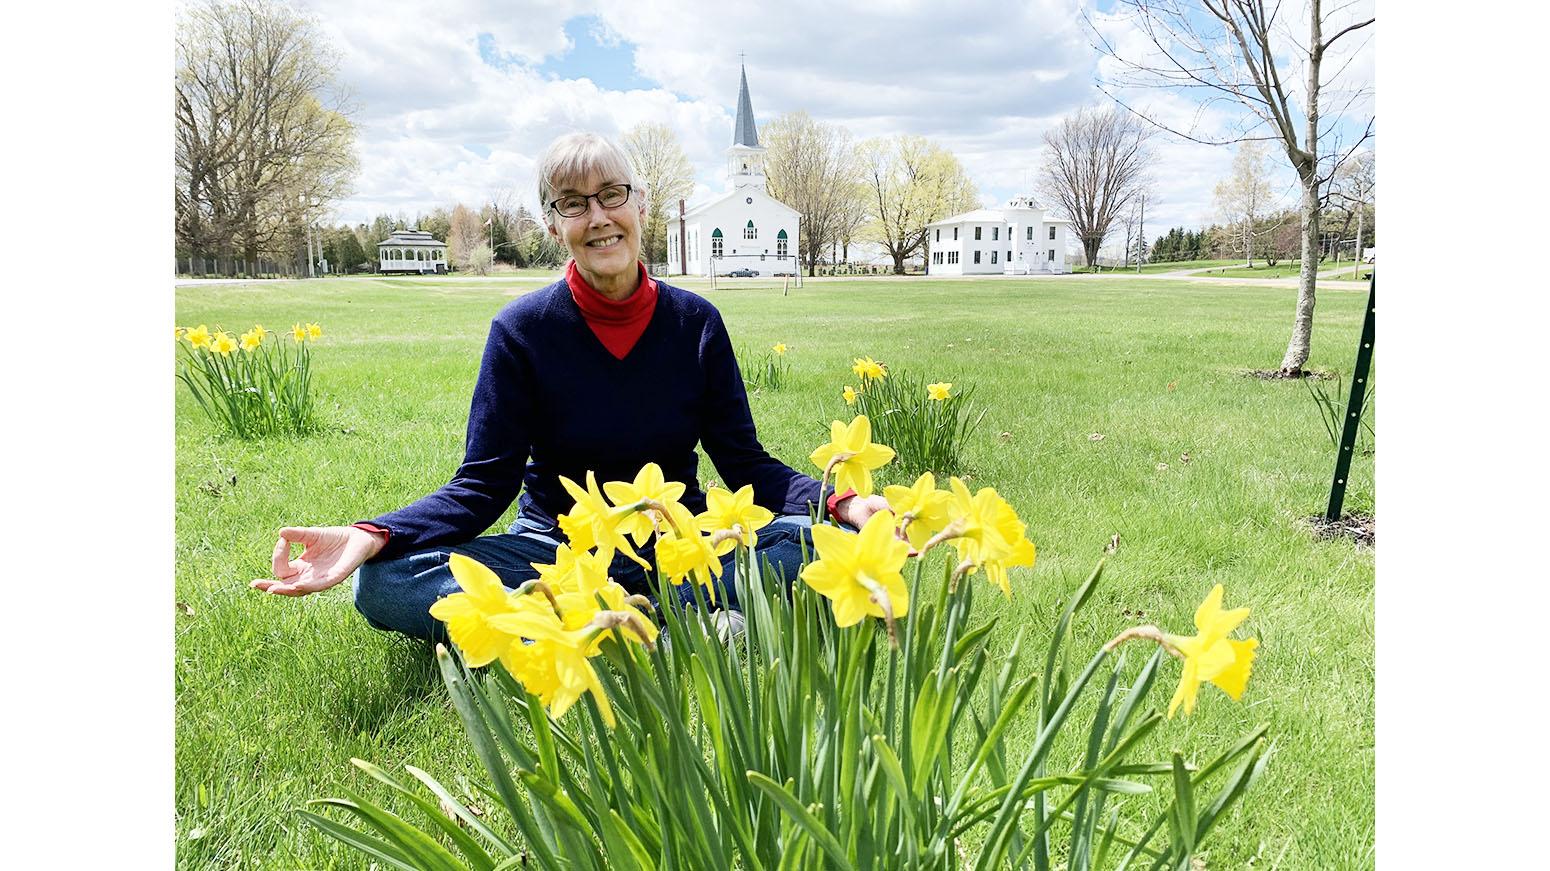 The Common daffodils are struggling